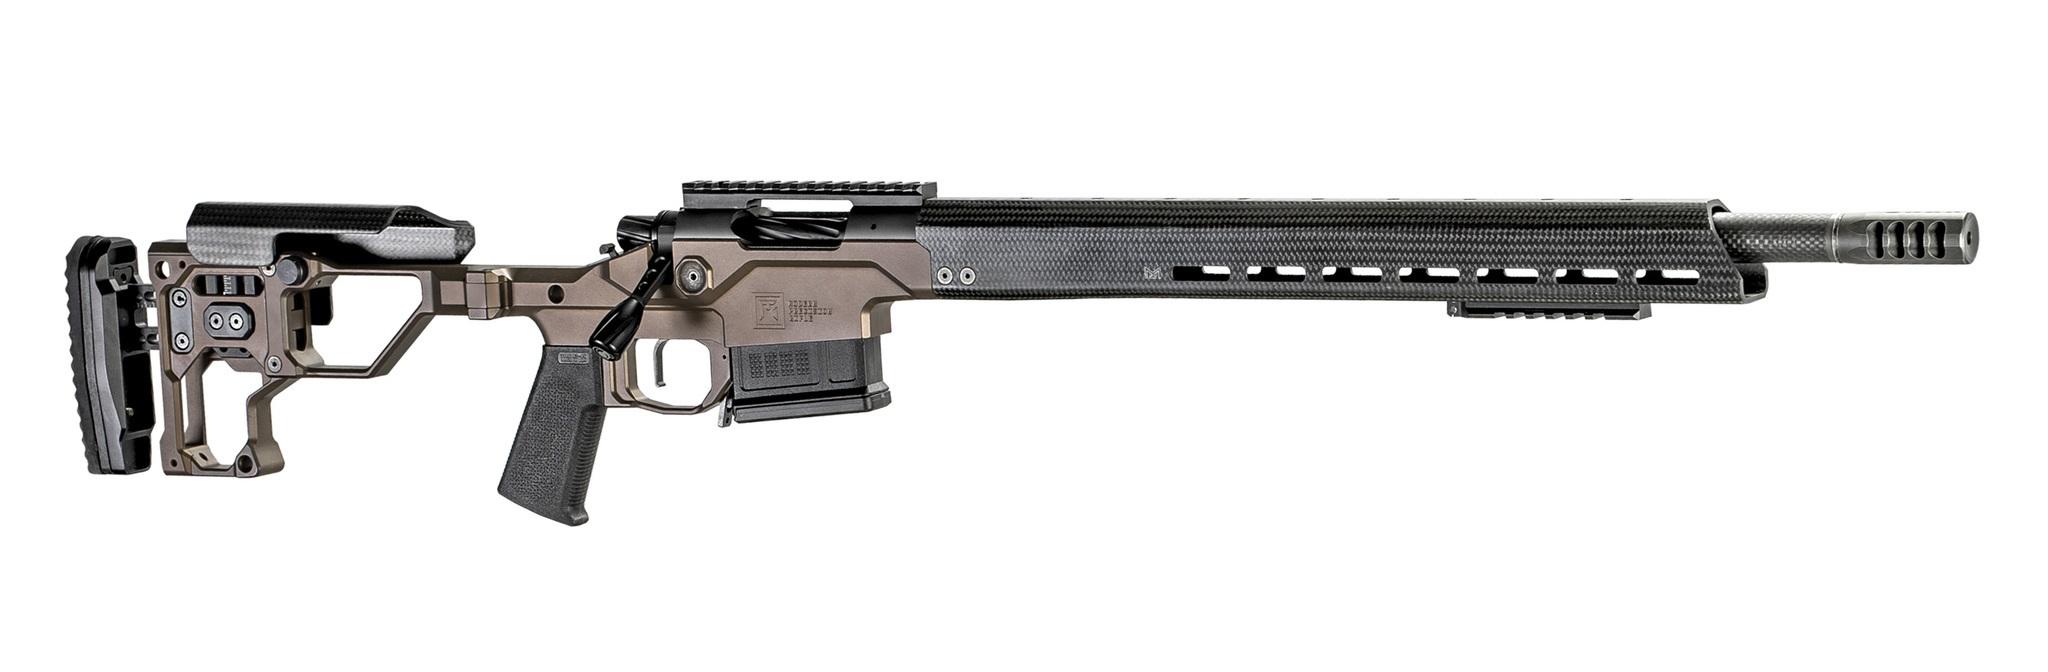 Christensen Arms Modern Precision Rifle 6.5 Creedmoor